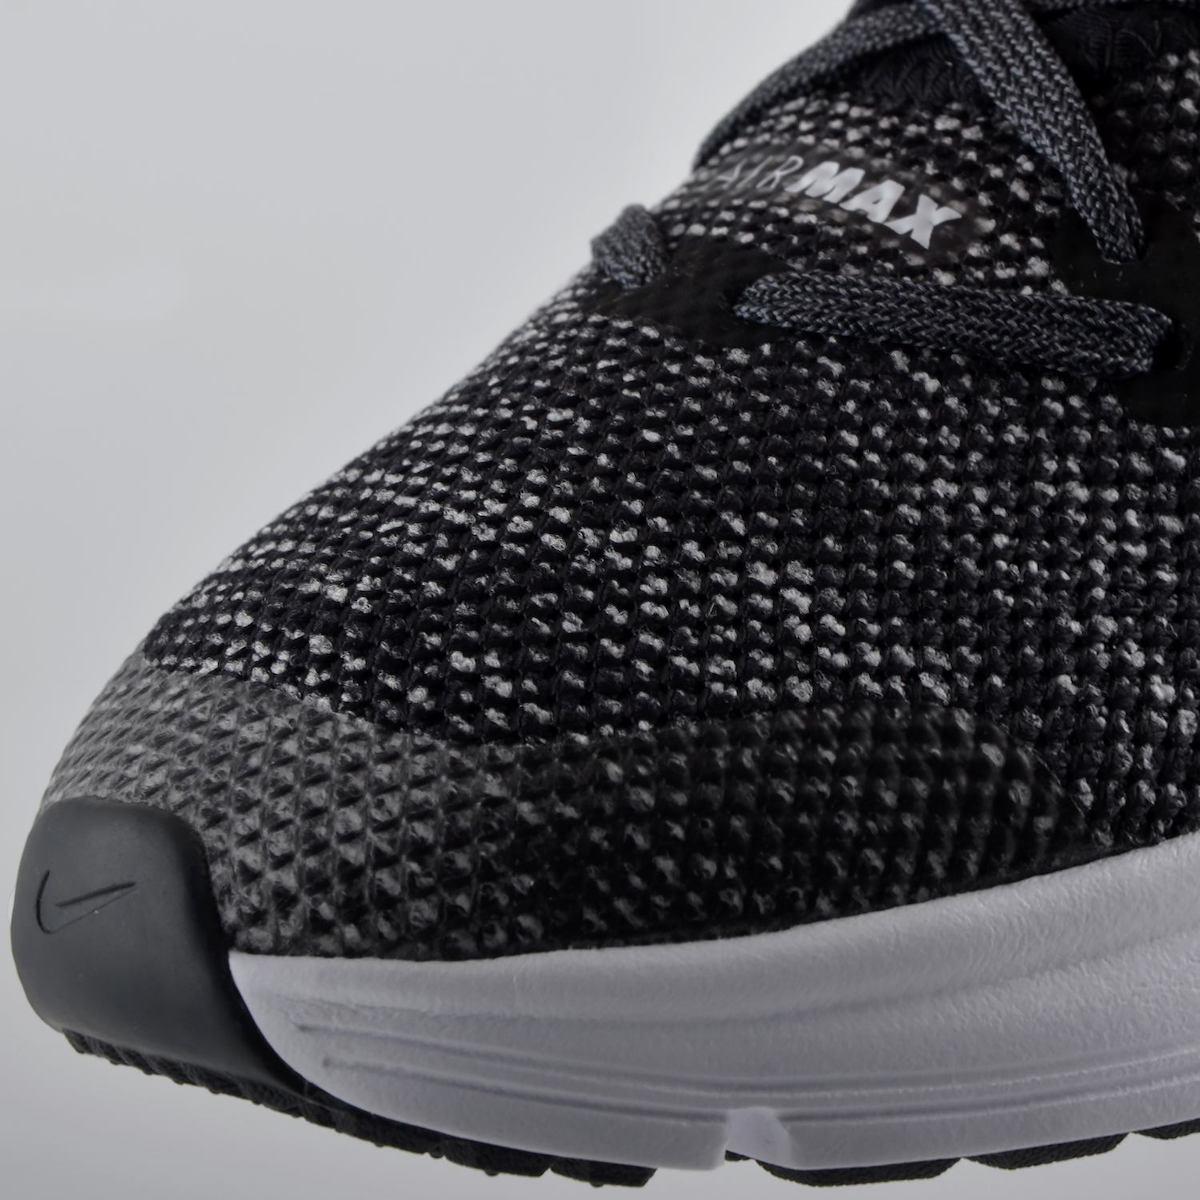 Nike Air Max Sequent 3 PS AO0554-001 - Skroutz.gr 4b368d400b8